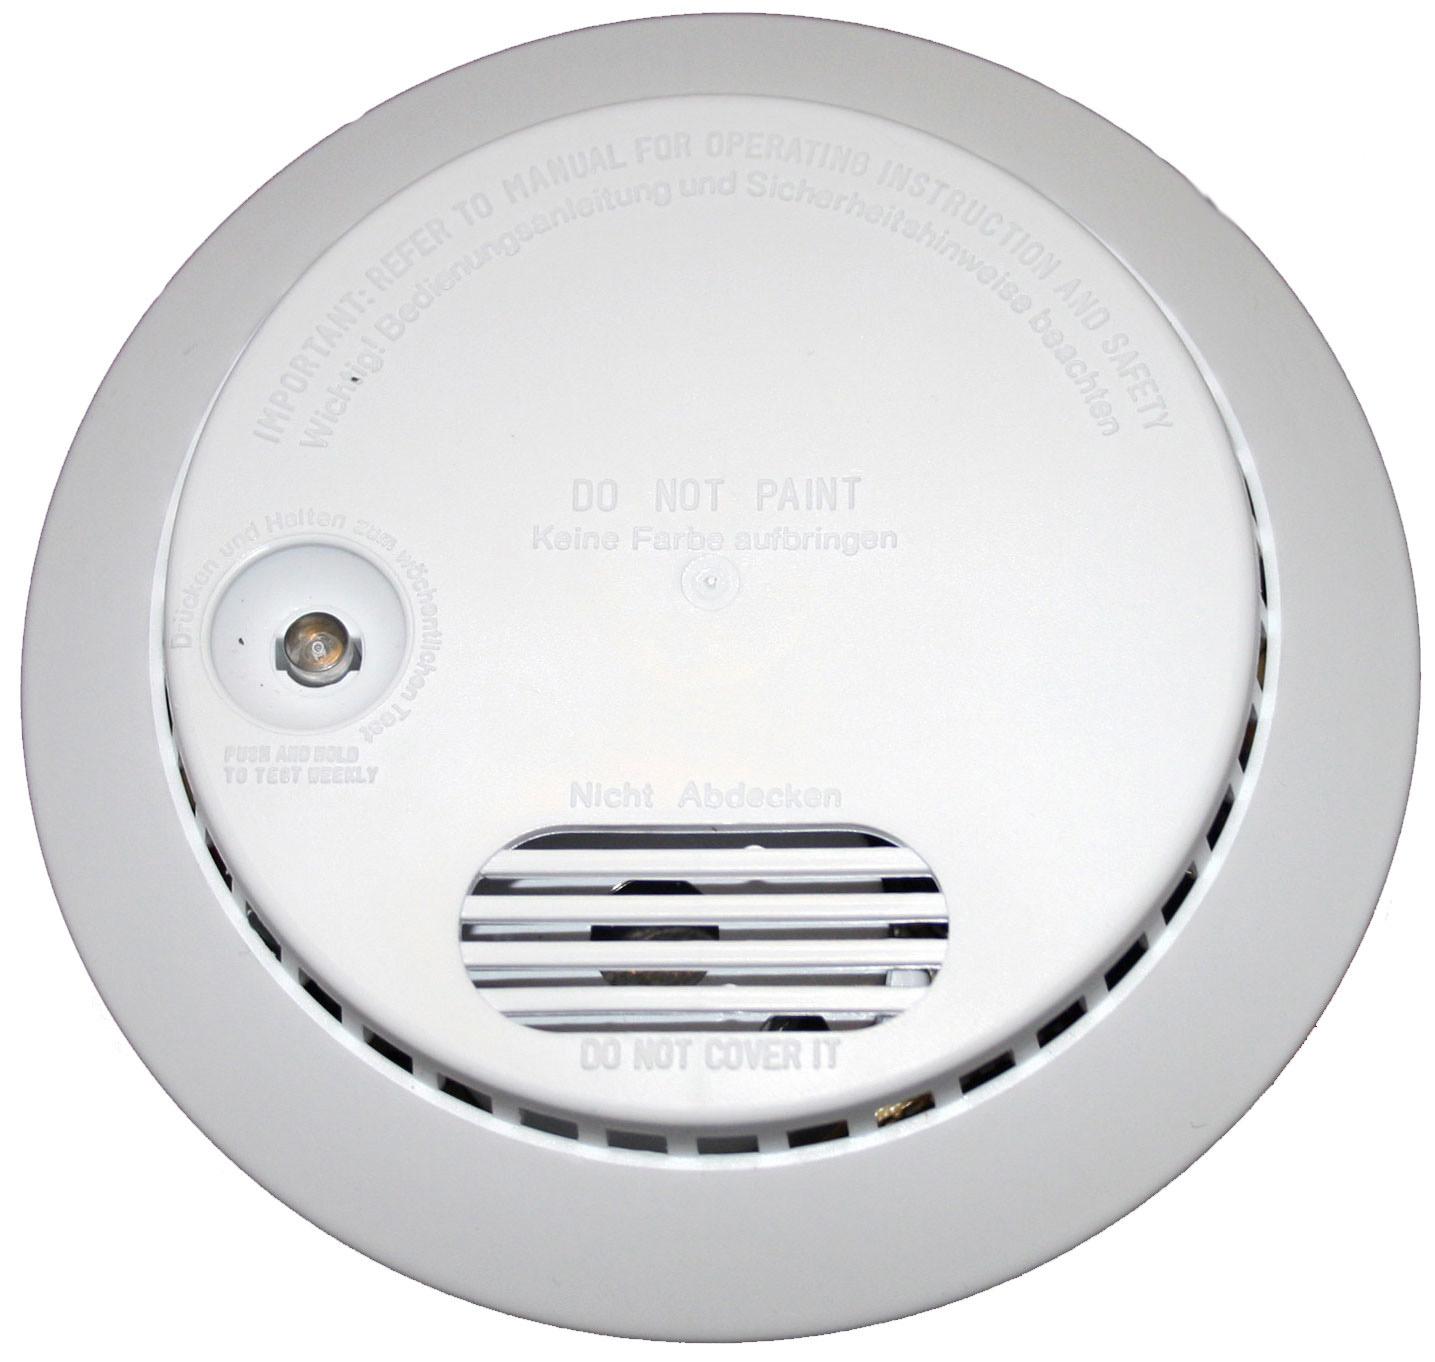 Ionization smoke detectors contain americium